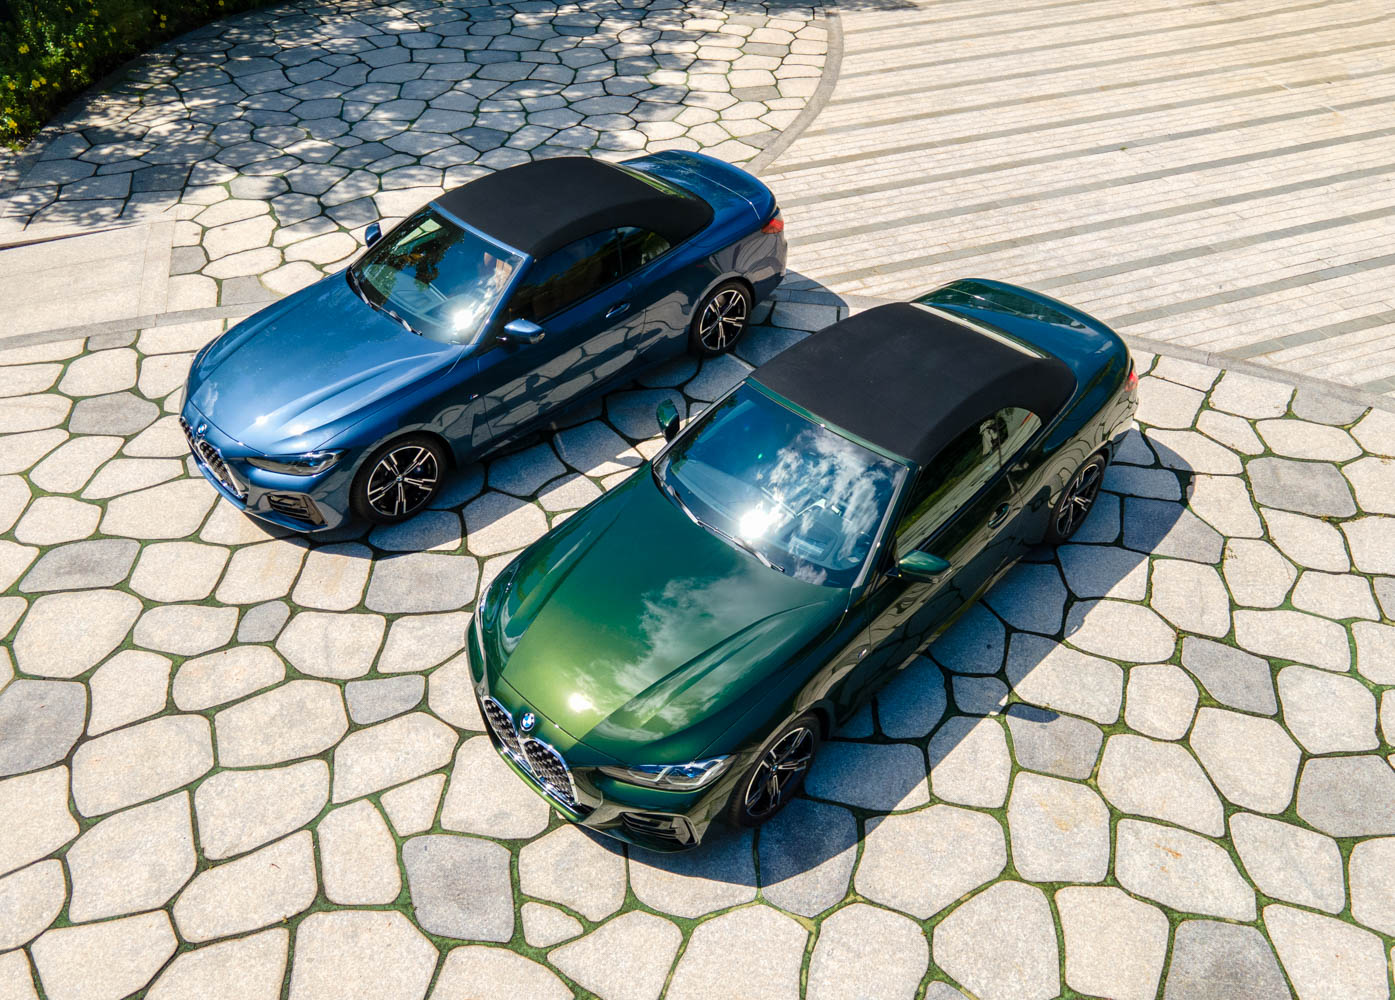 xe-BMW-4-Series-Convertible-ra-mat-anh_1.JPG